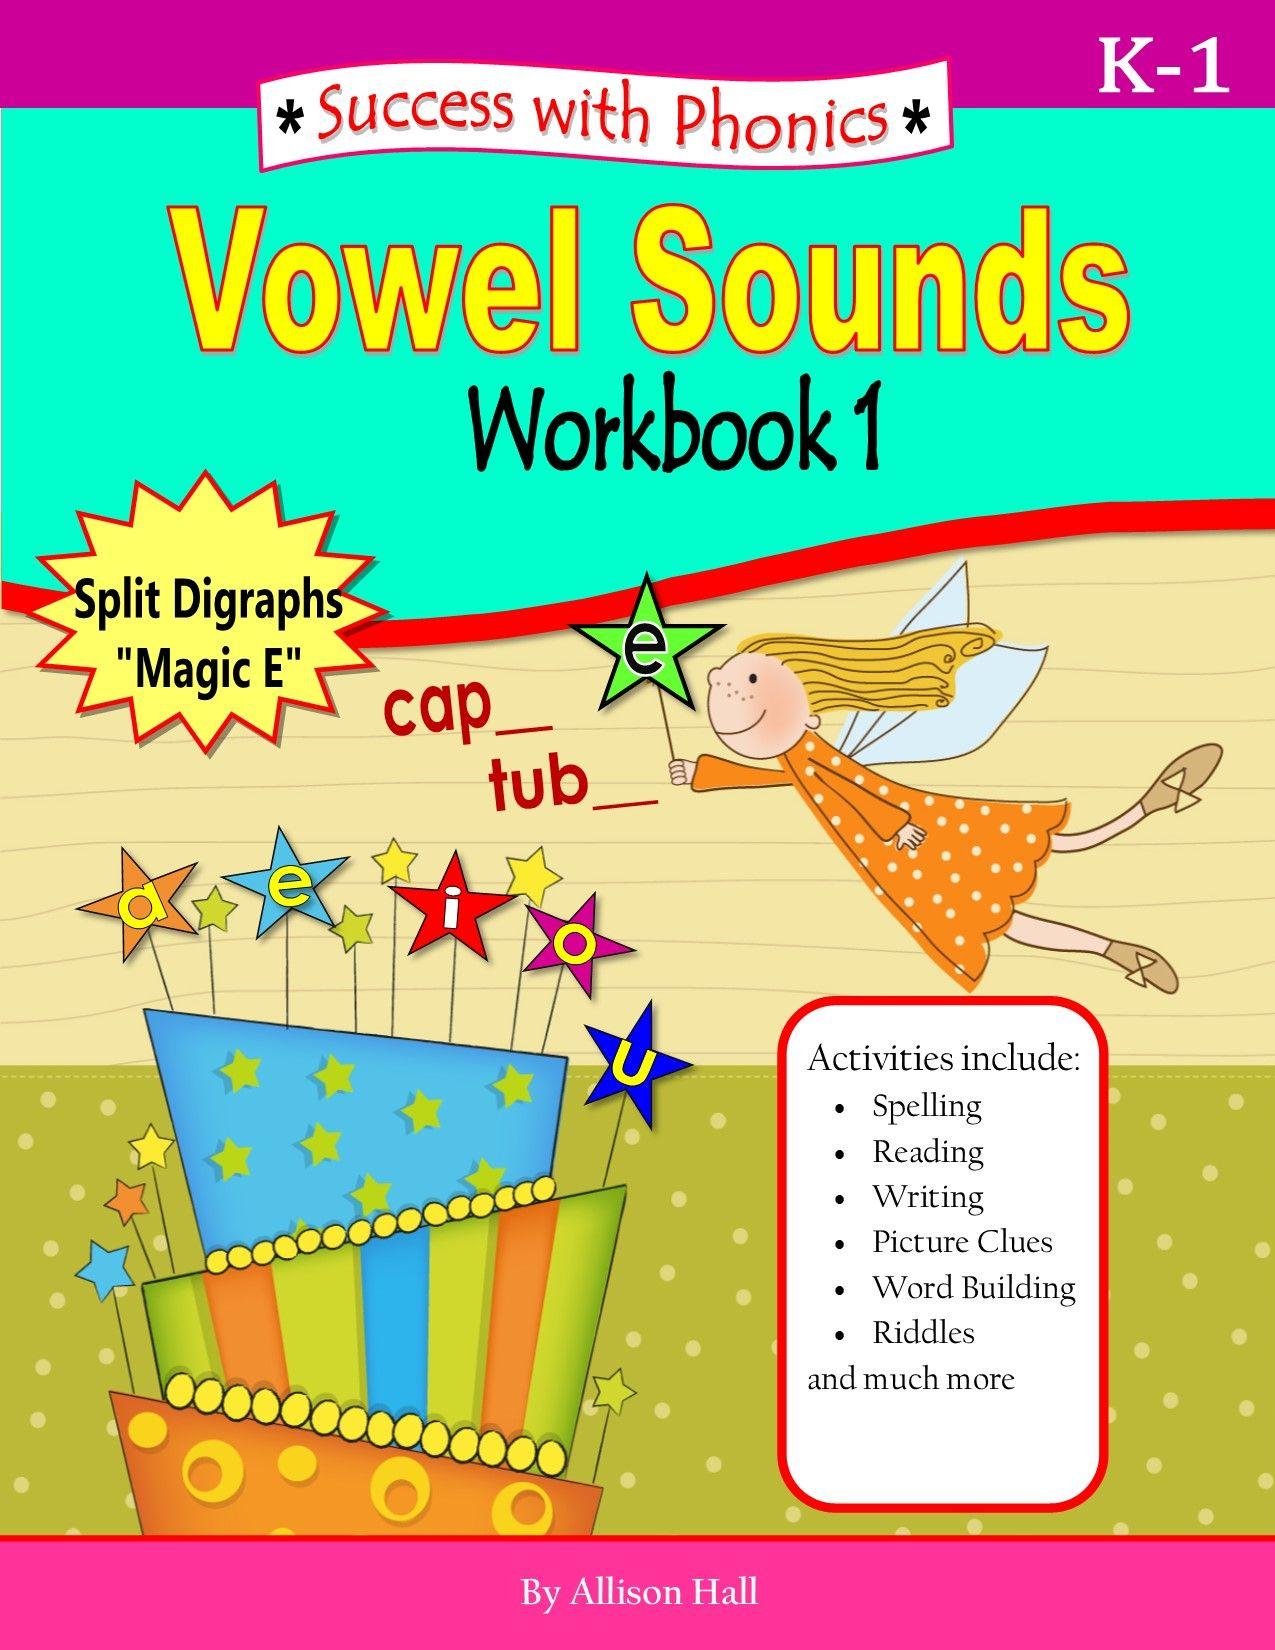 Vowel Sounds Split Digraphs Magic E With Images